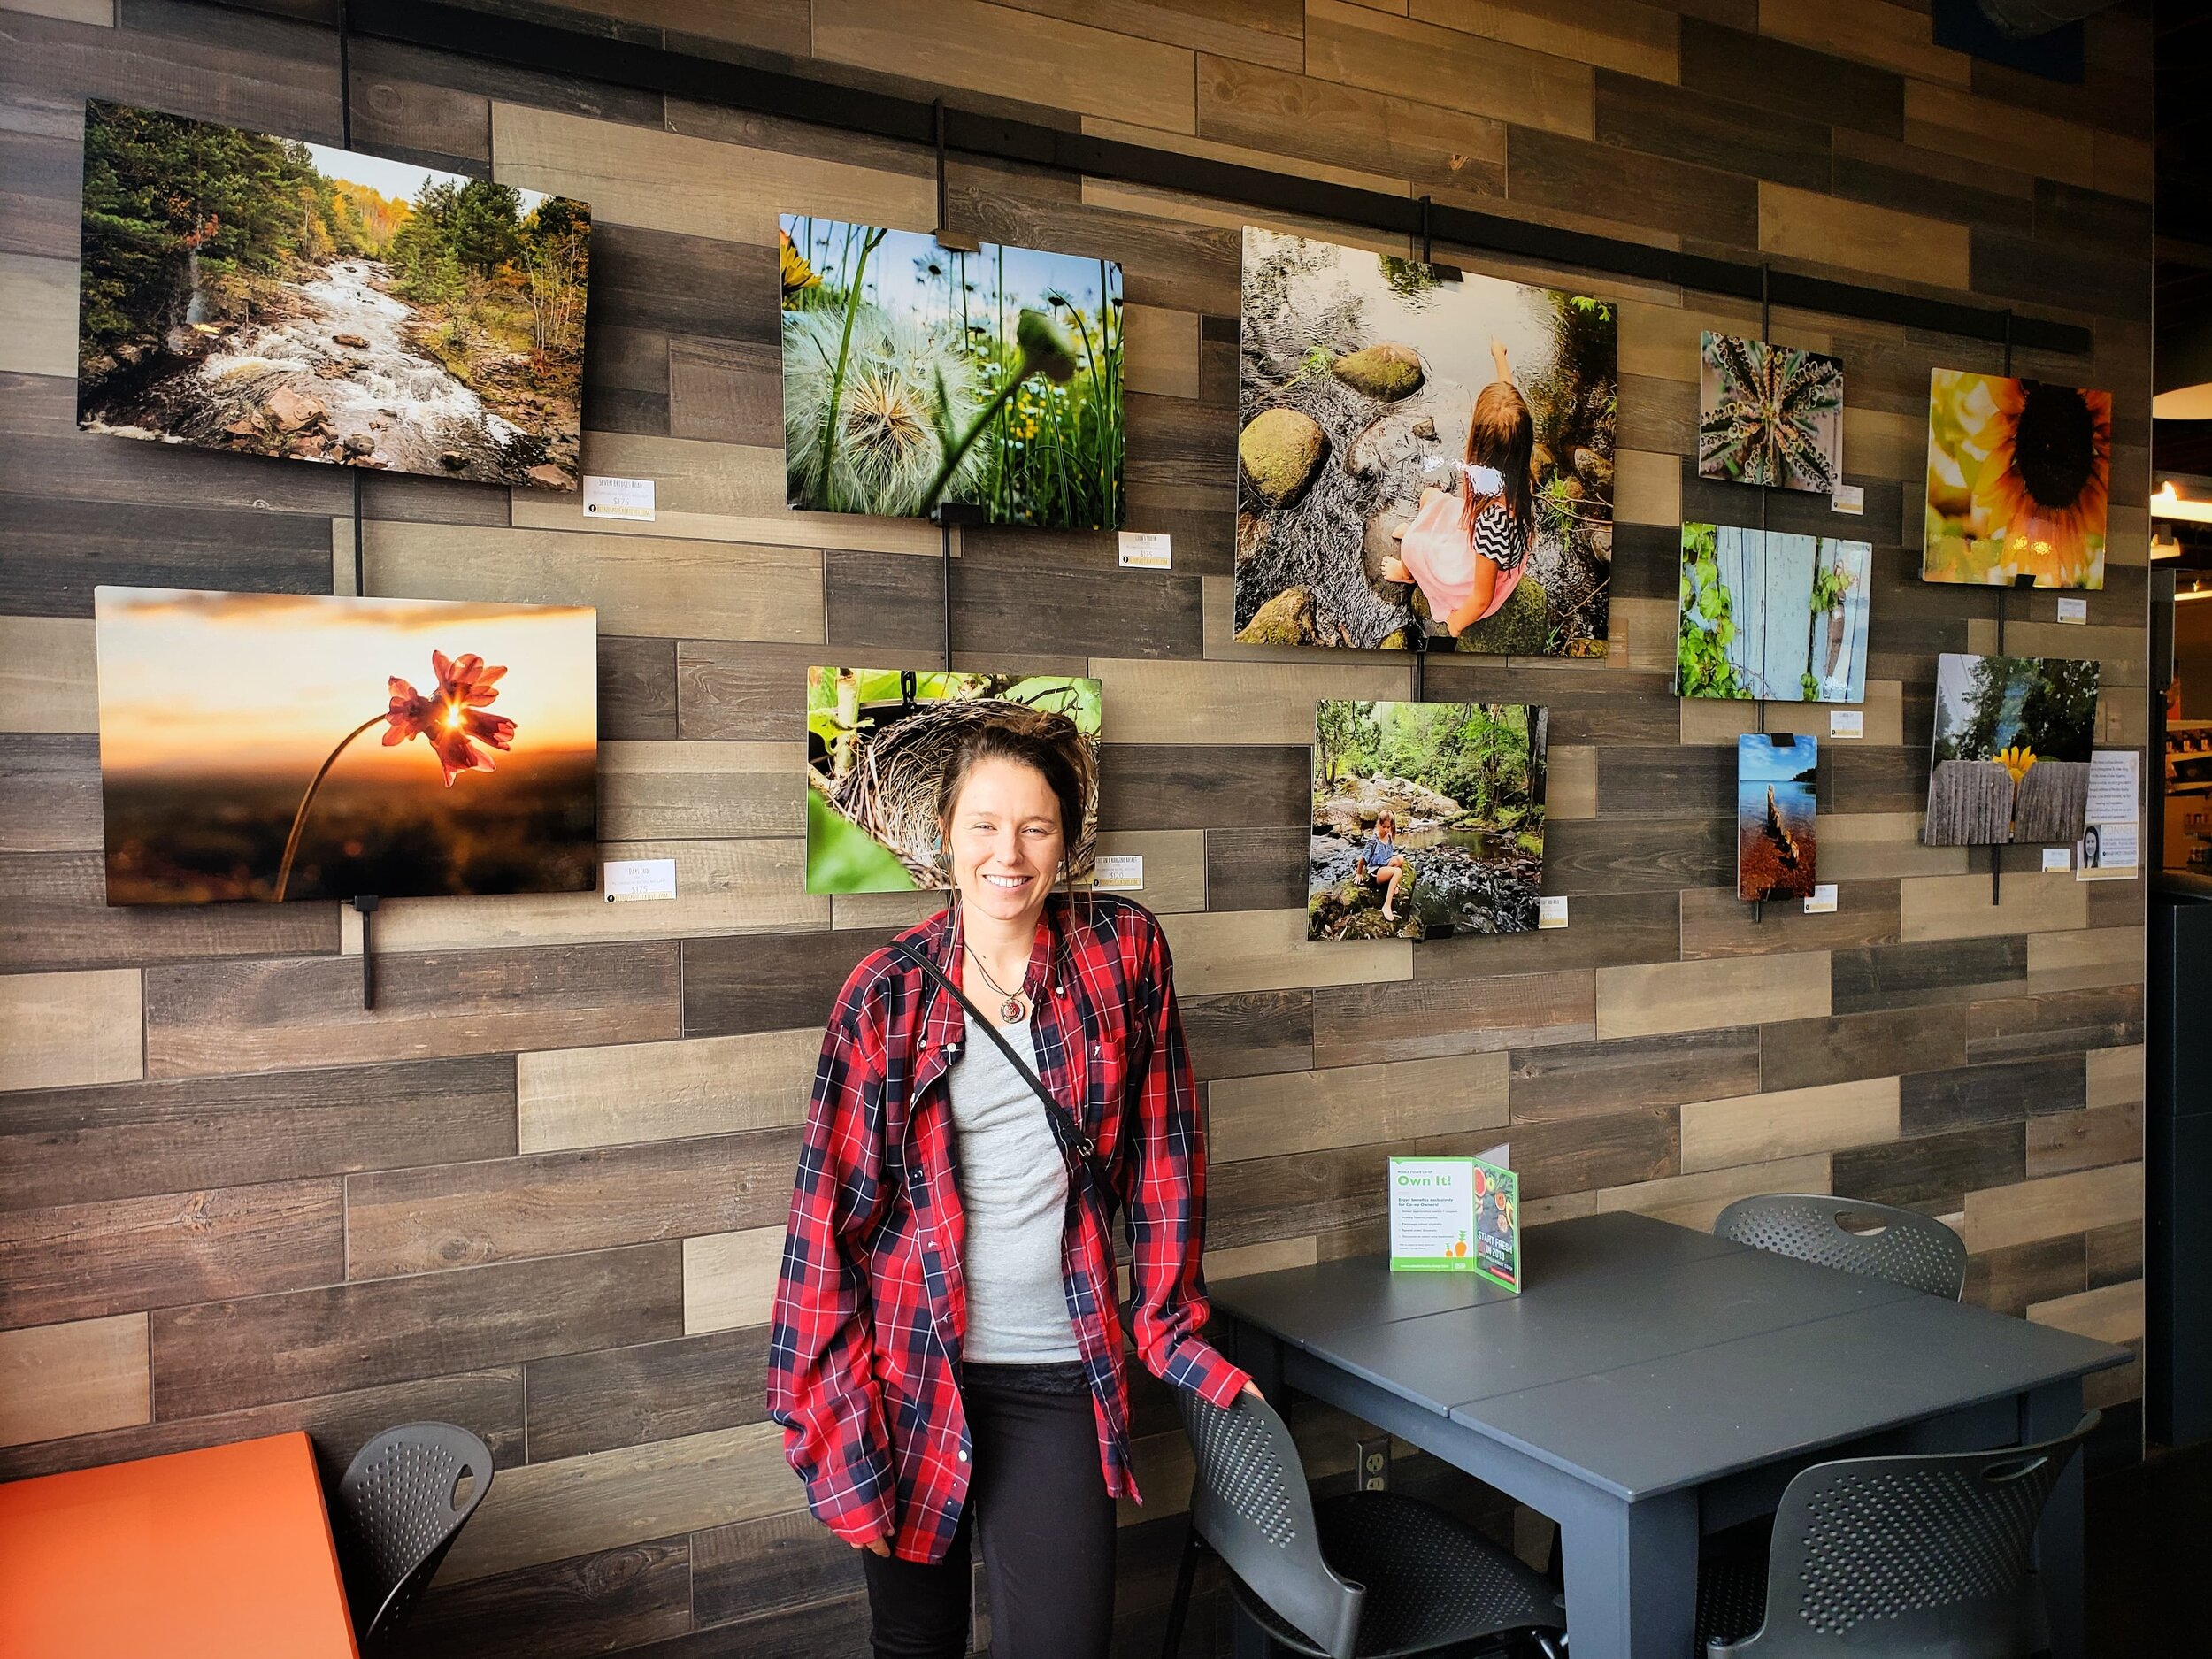 Alyssa Johnson - Photography - Duluth, Minnesota - Whole Foods Co-op - On Display